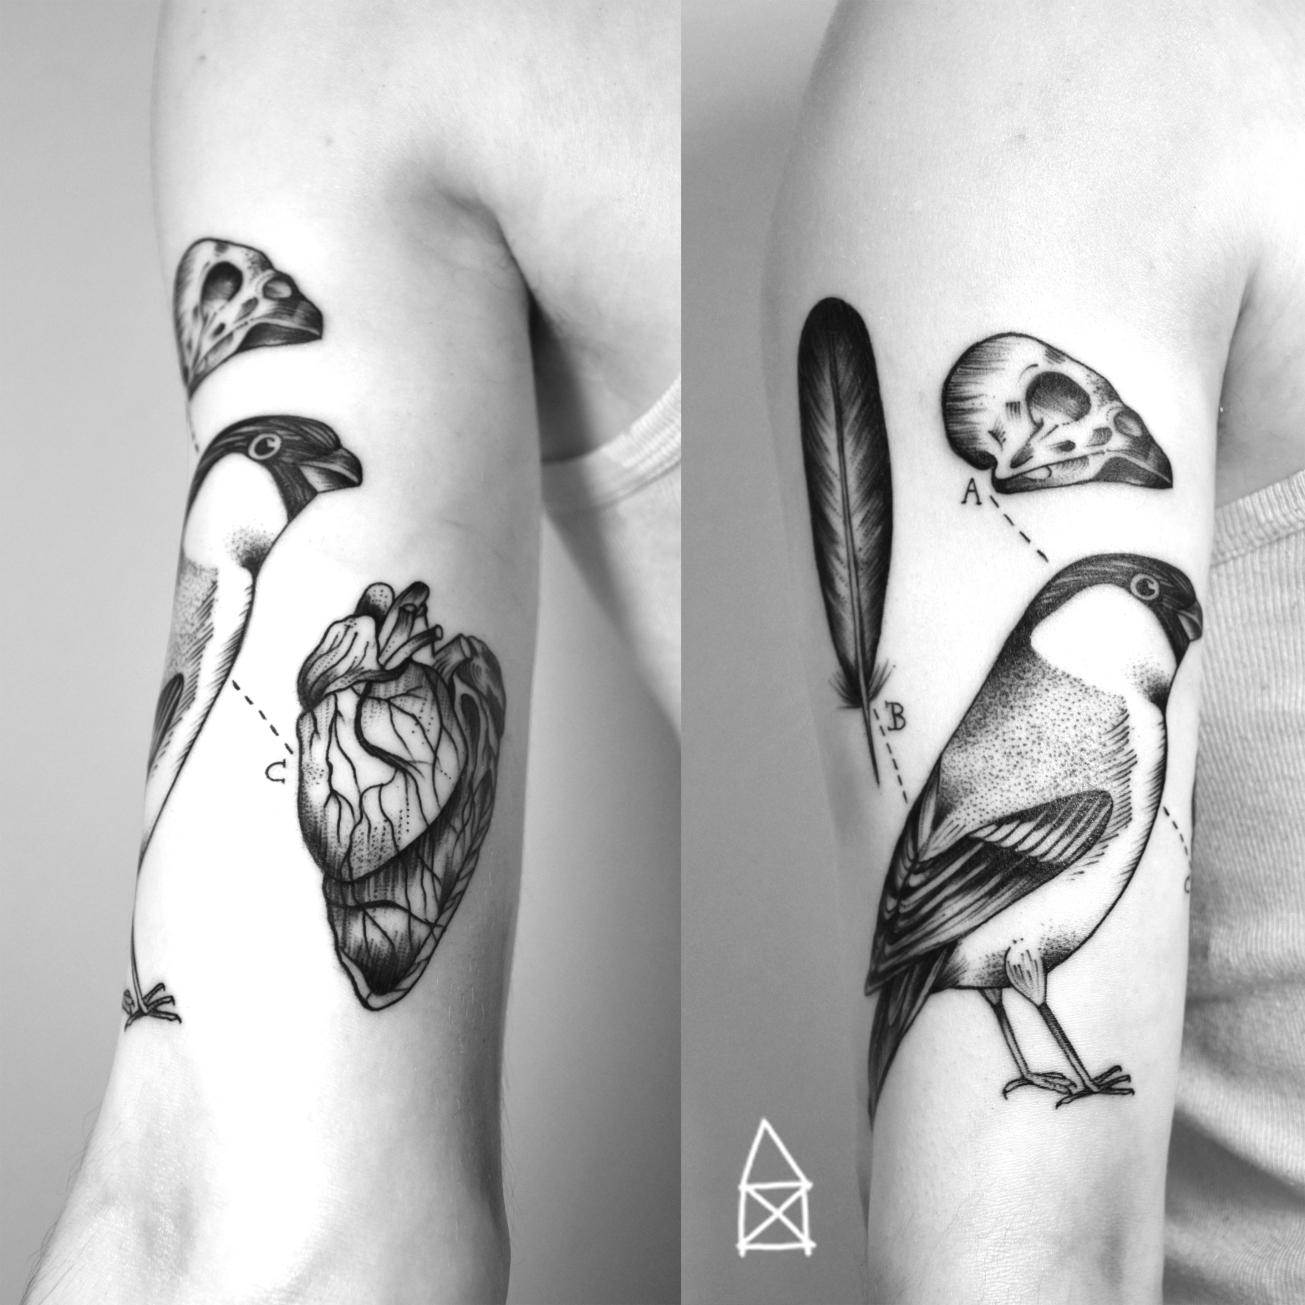 MiriamFrank_tattoo-finch